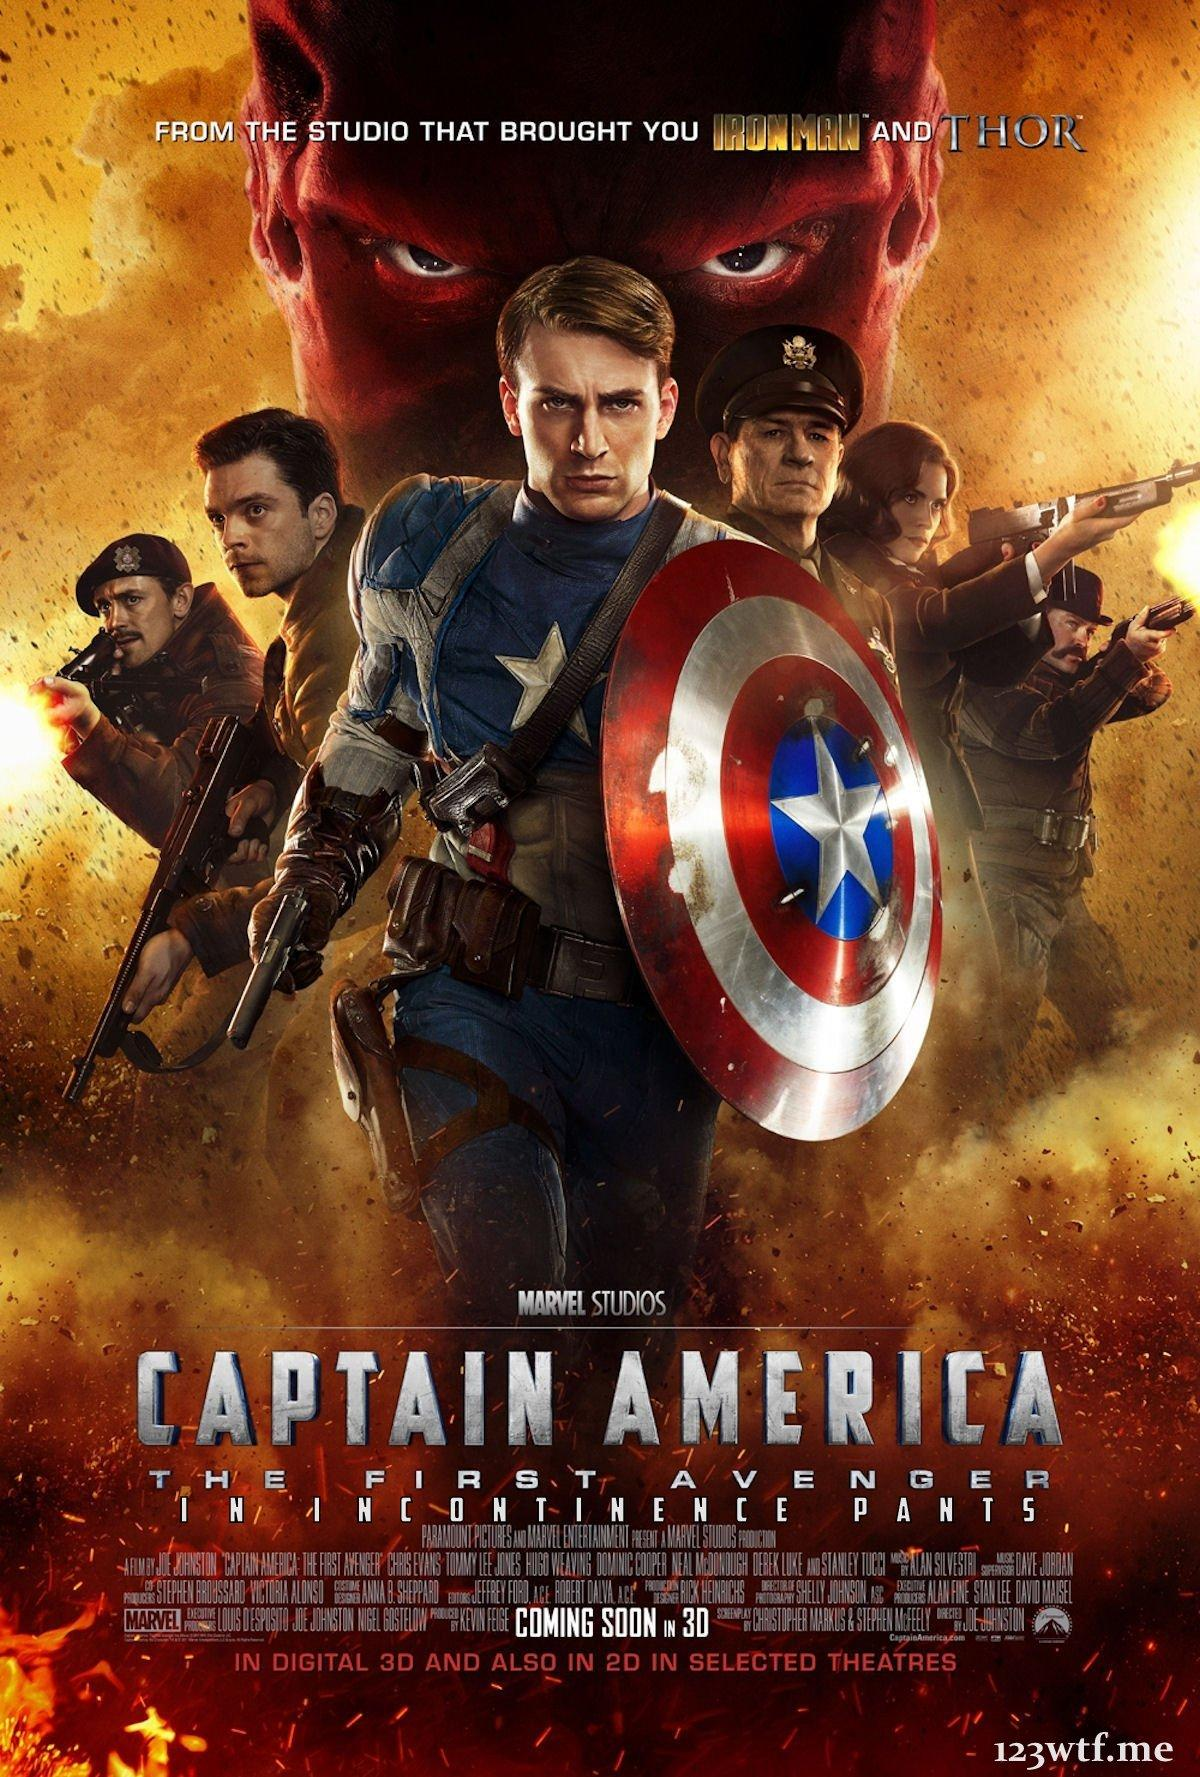 Captain%20America%20The%20First%20Avenger%202011.5 1 دانلود فیلم Captain America: The First Avenger 2011 : کیفیت BluRay REMUX با حجم ۲۹ گیگابایت اضافه شد